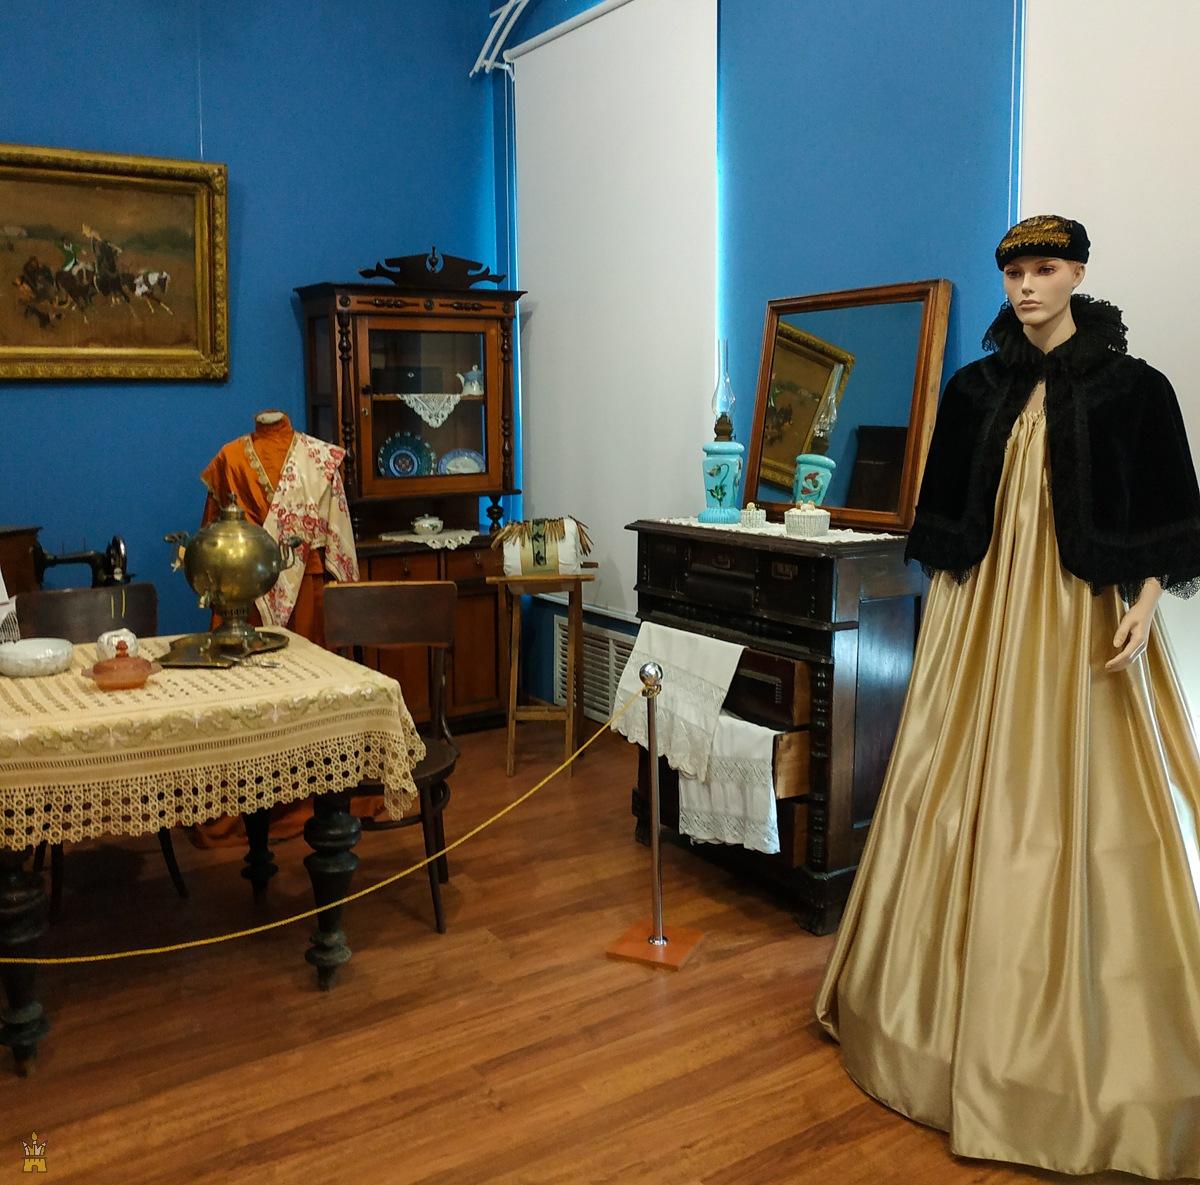 Музей балахнинского кружева